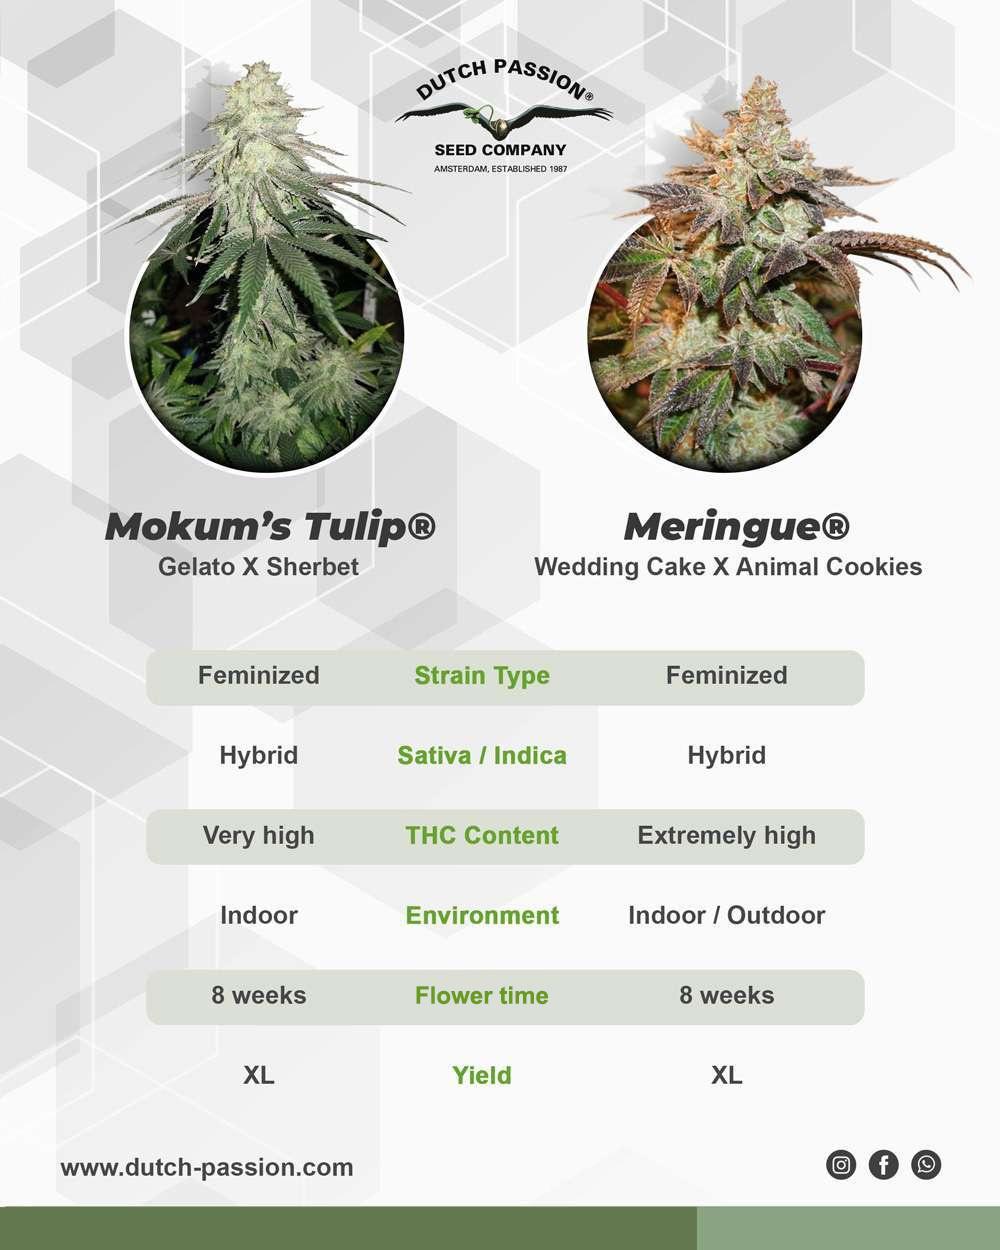 Mokum's Tulip vs Meringue